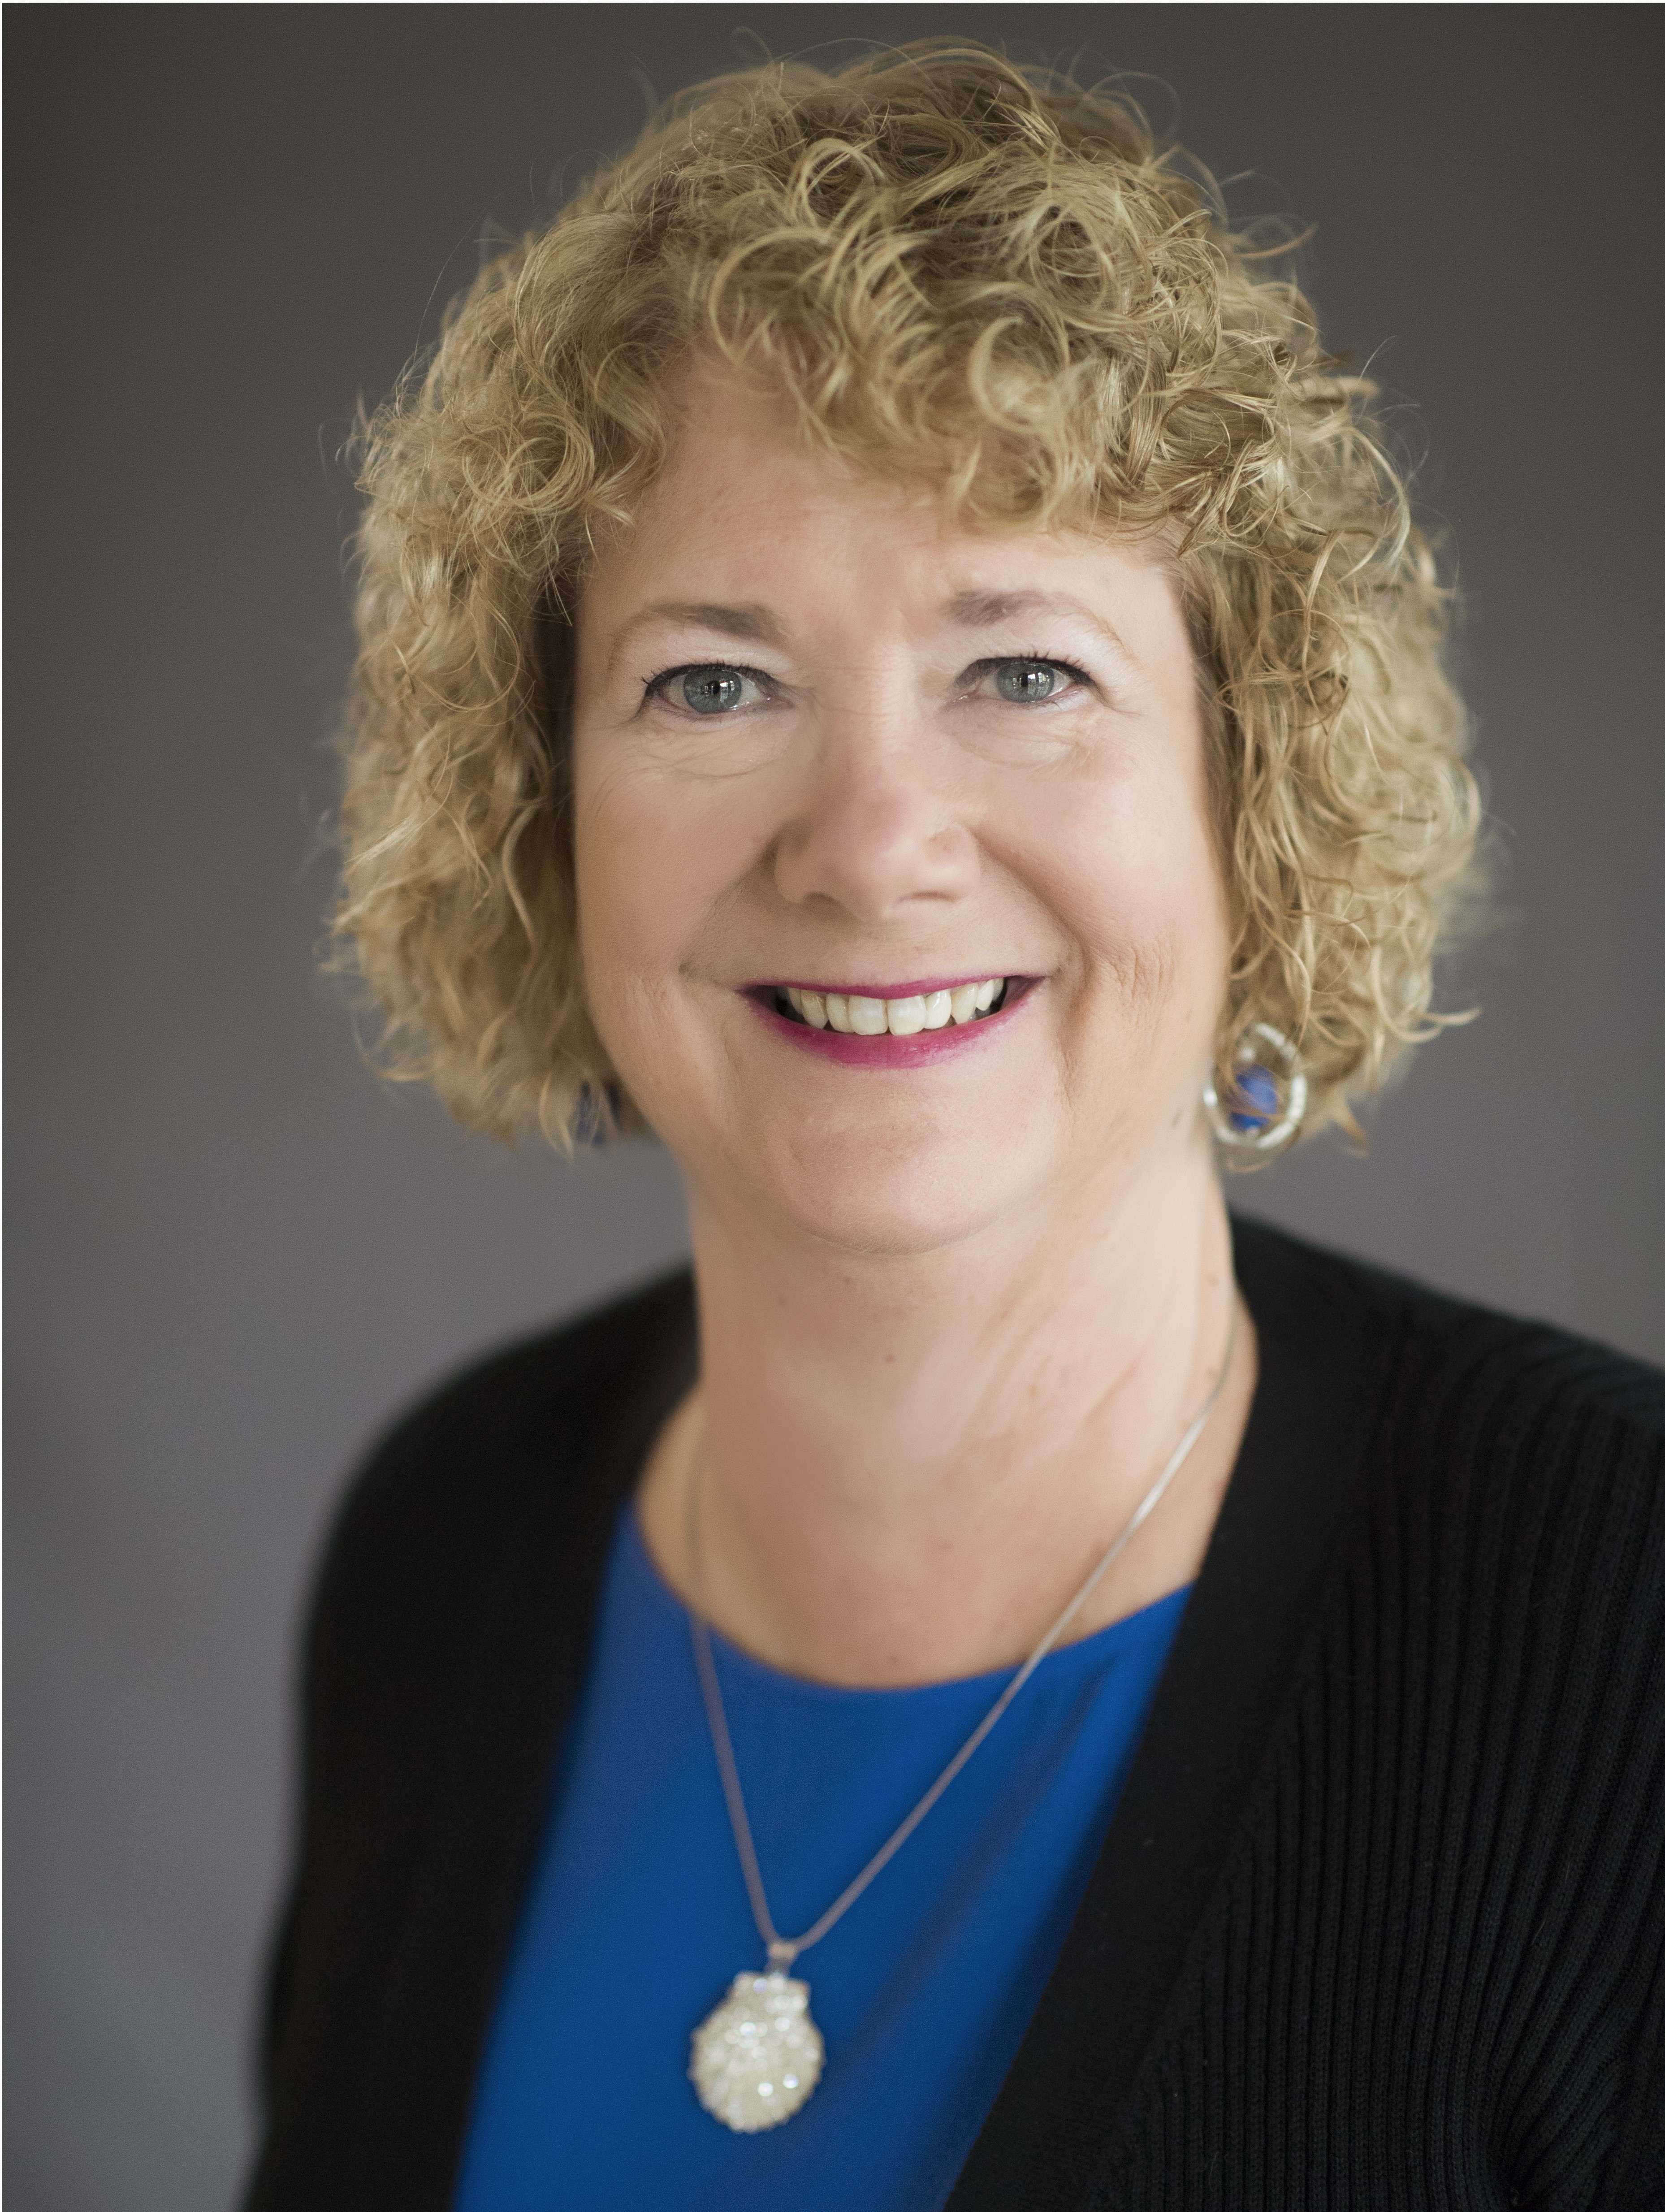 Deborah L. Mays